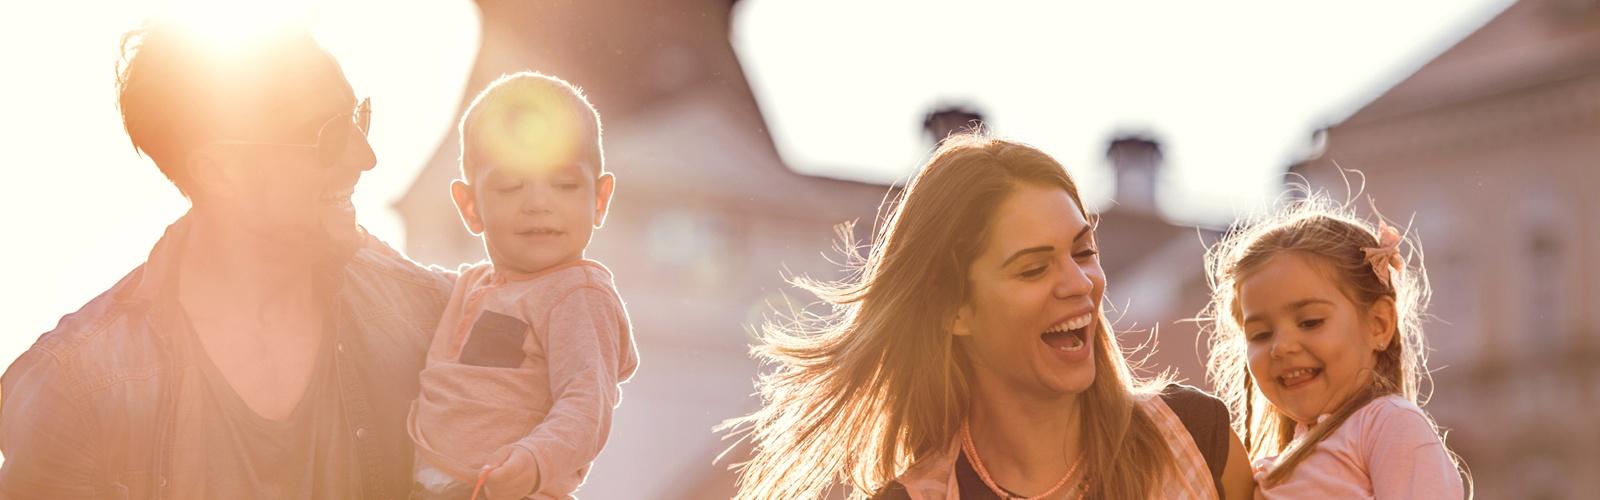 Background image - happy family